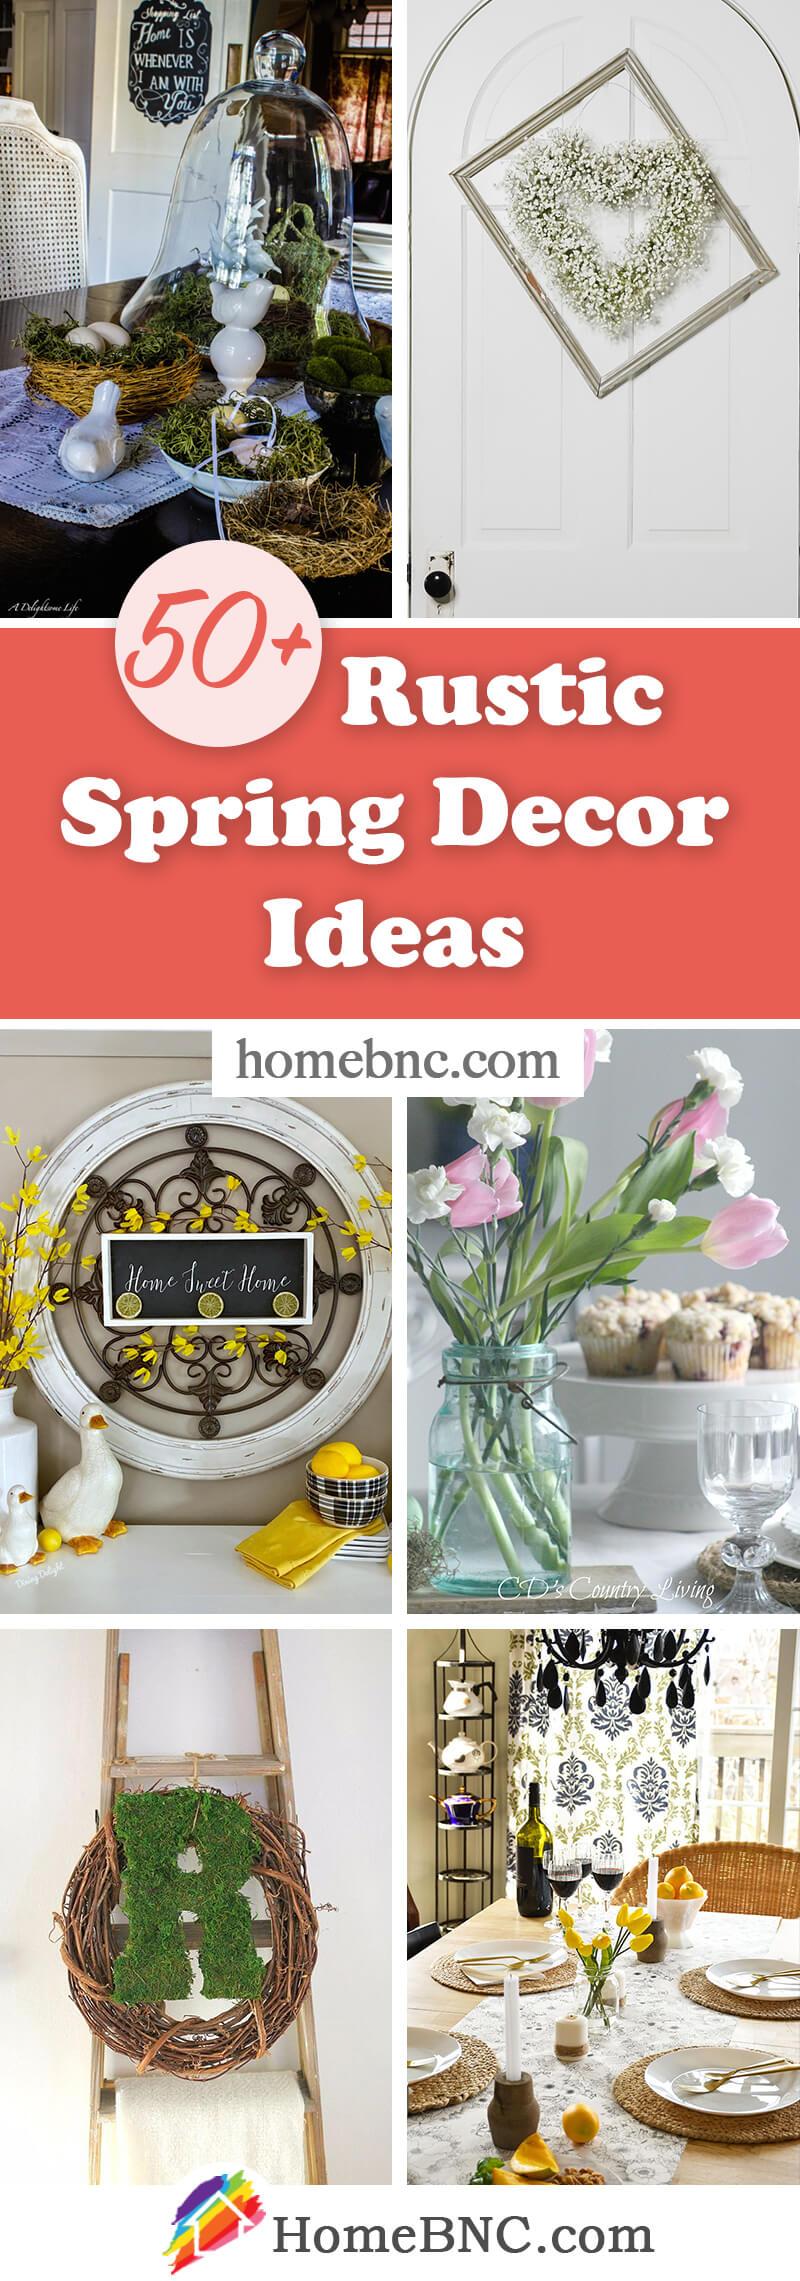 Rustic Farmhouse Spring Decor Ideas